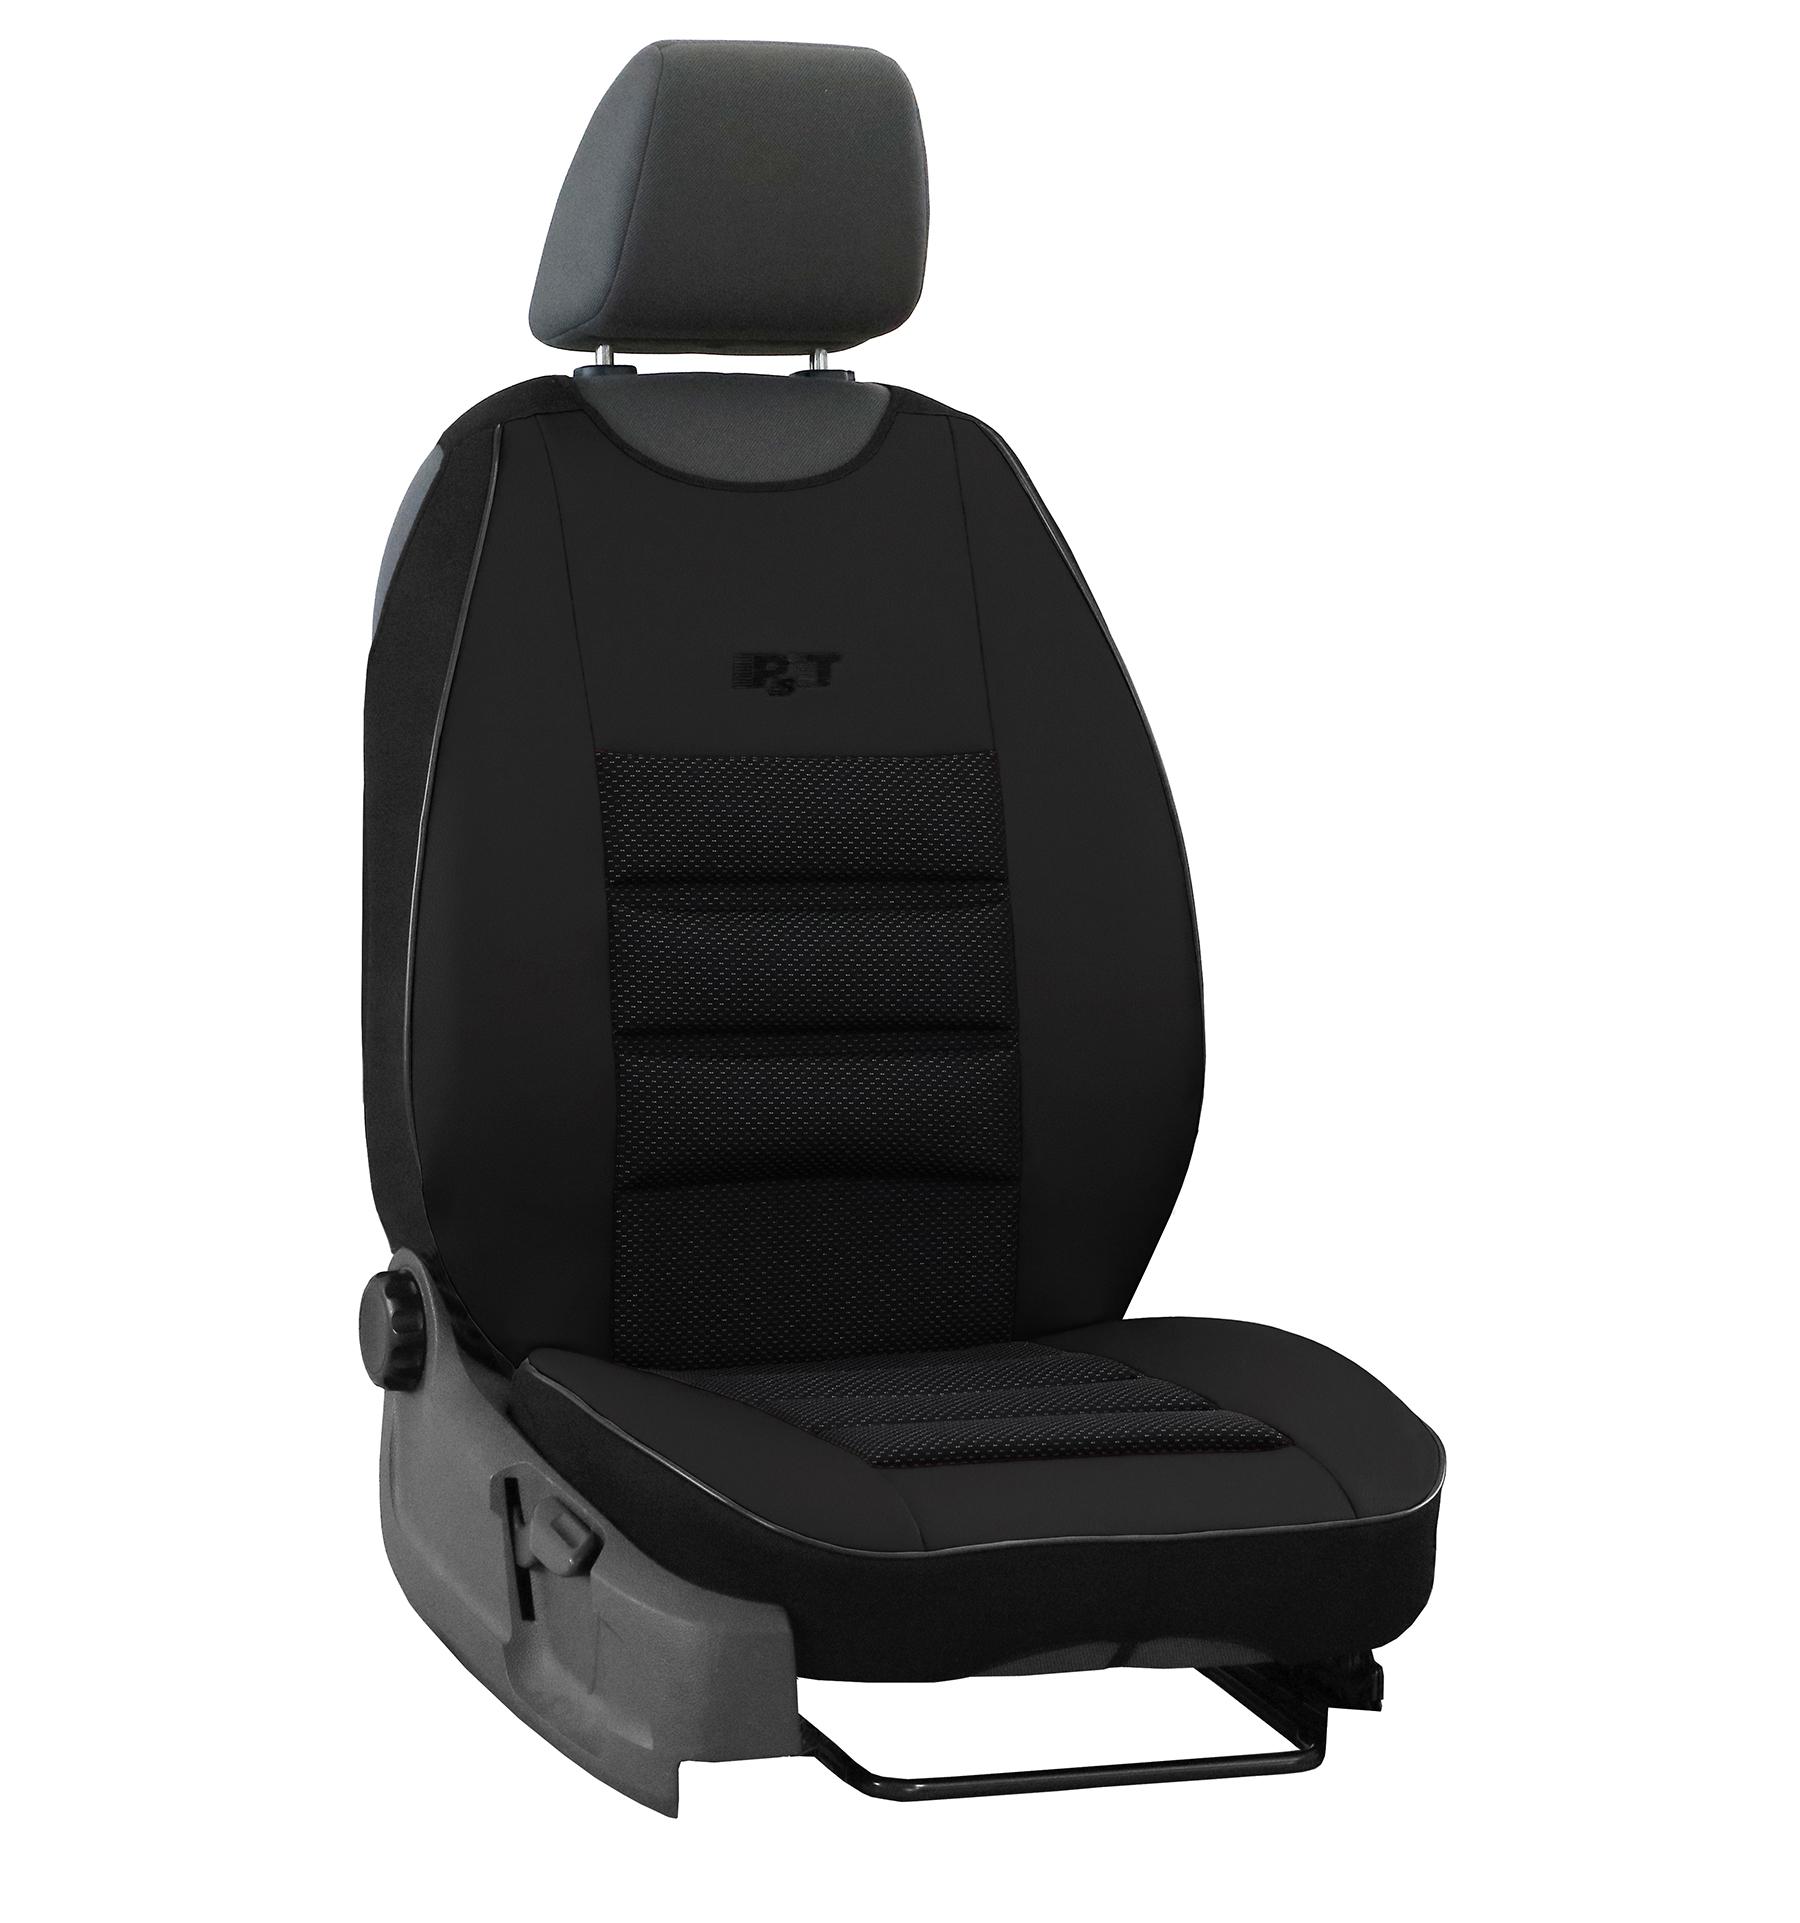 Automega Ergonomický potah na 1 sedadlo ERGONOMIC LEATHER, černý